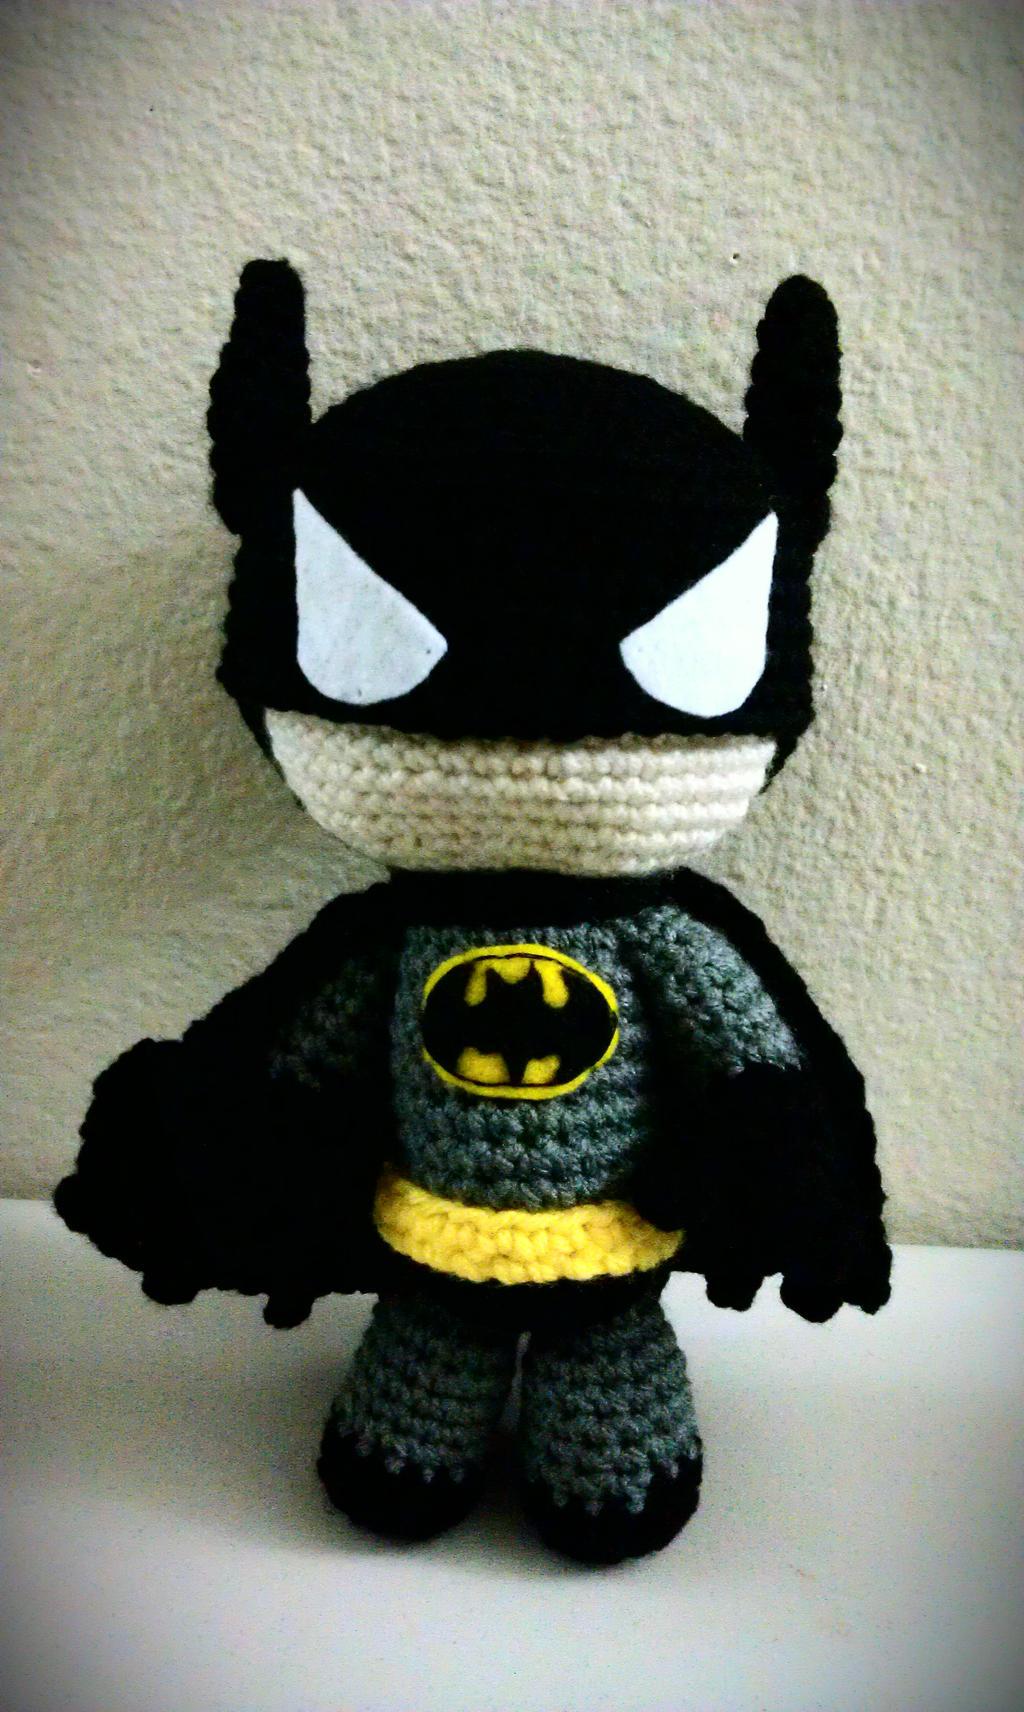 Amigurumi Fox Crochet Pattern Free : New Batman Sackboy! by LucreziaNatas on DeviantArt